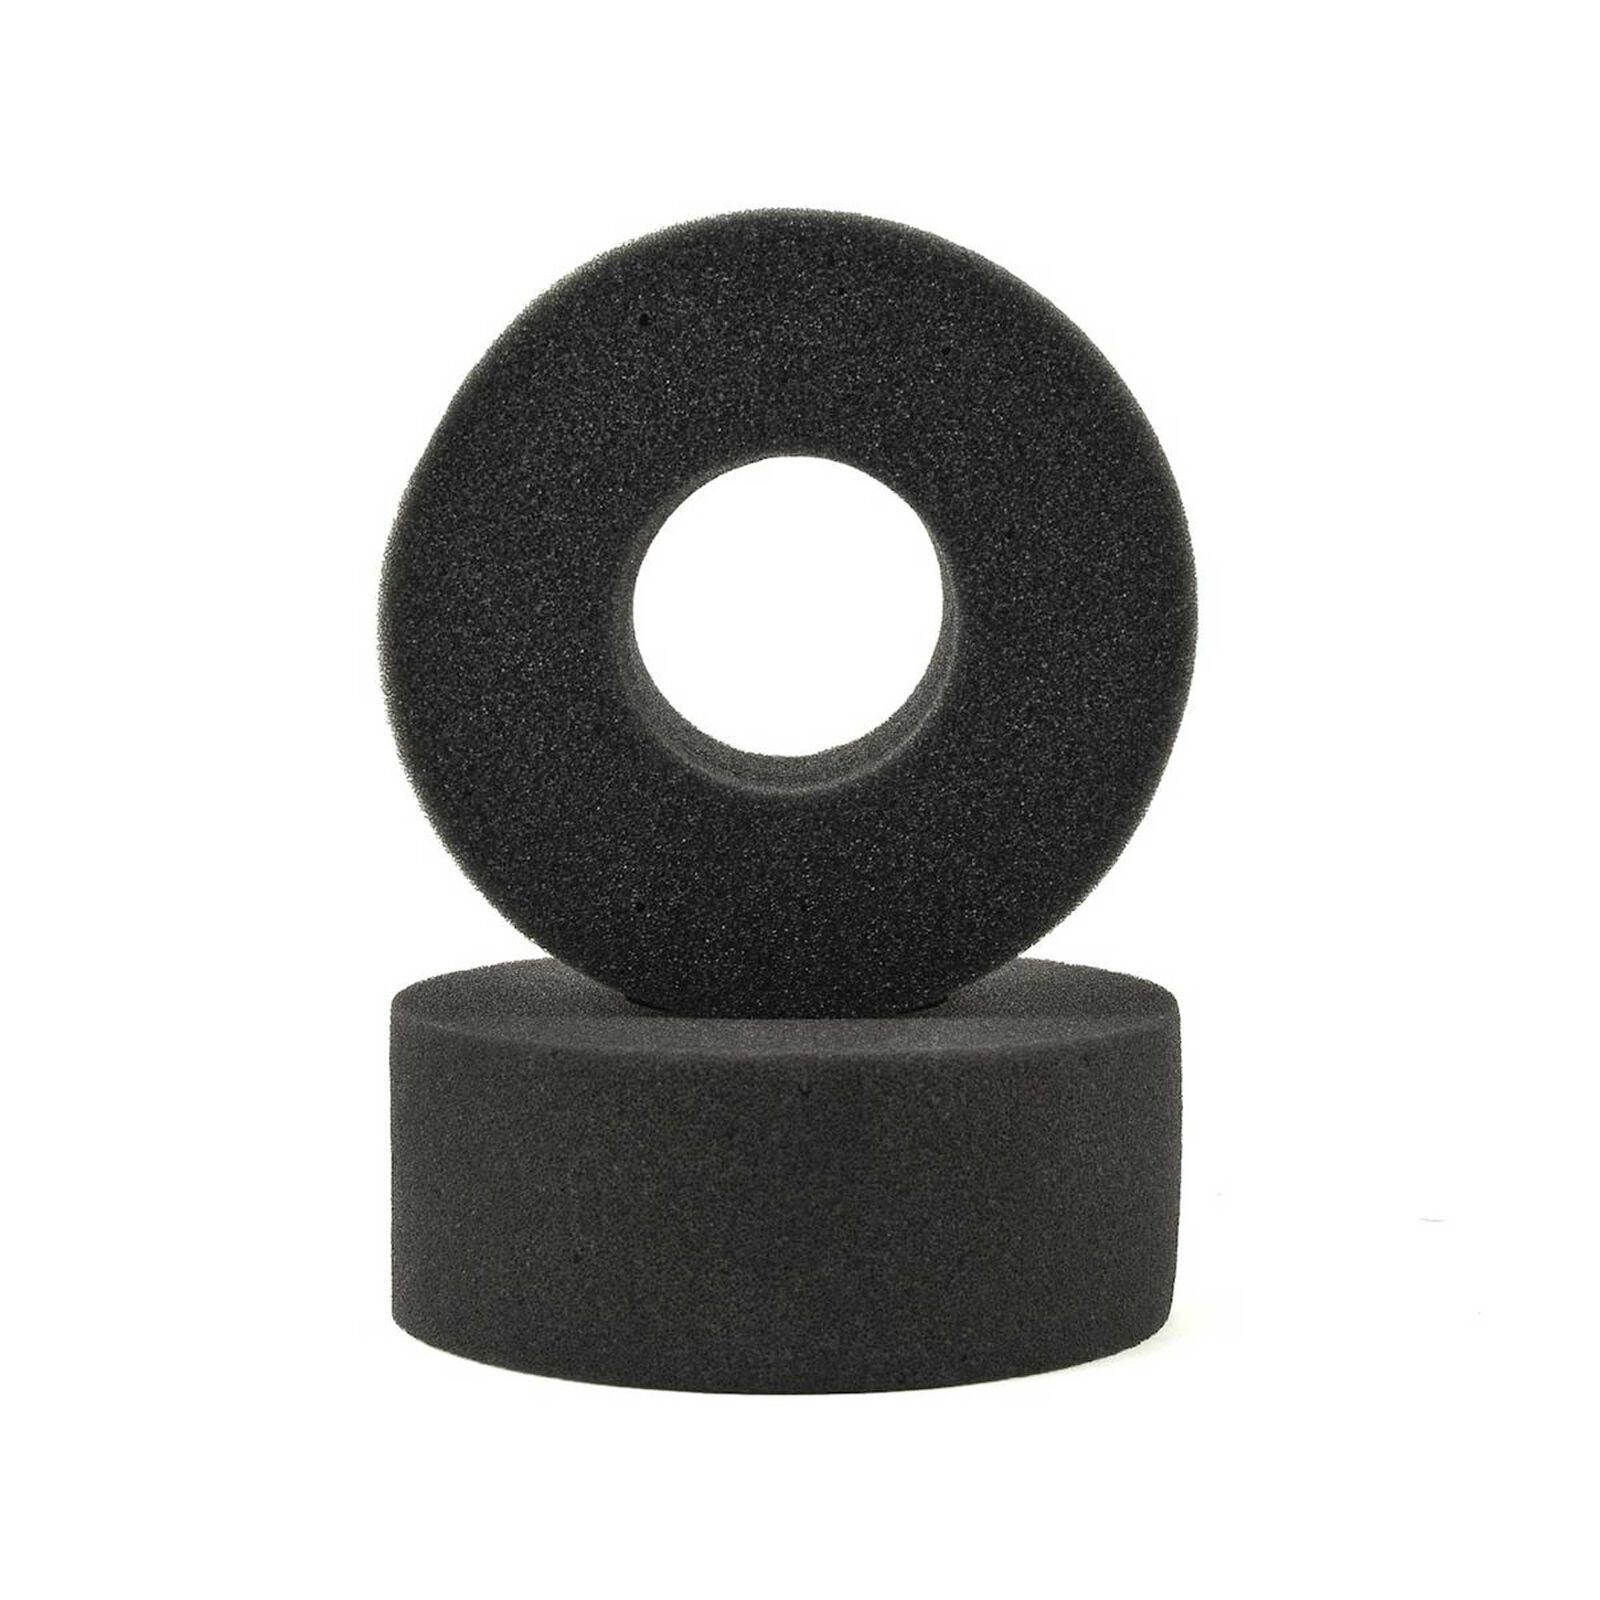 Dirty Richard Single Stage Foam Inserts  Soft 121.5x47.6x37.4 (2)